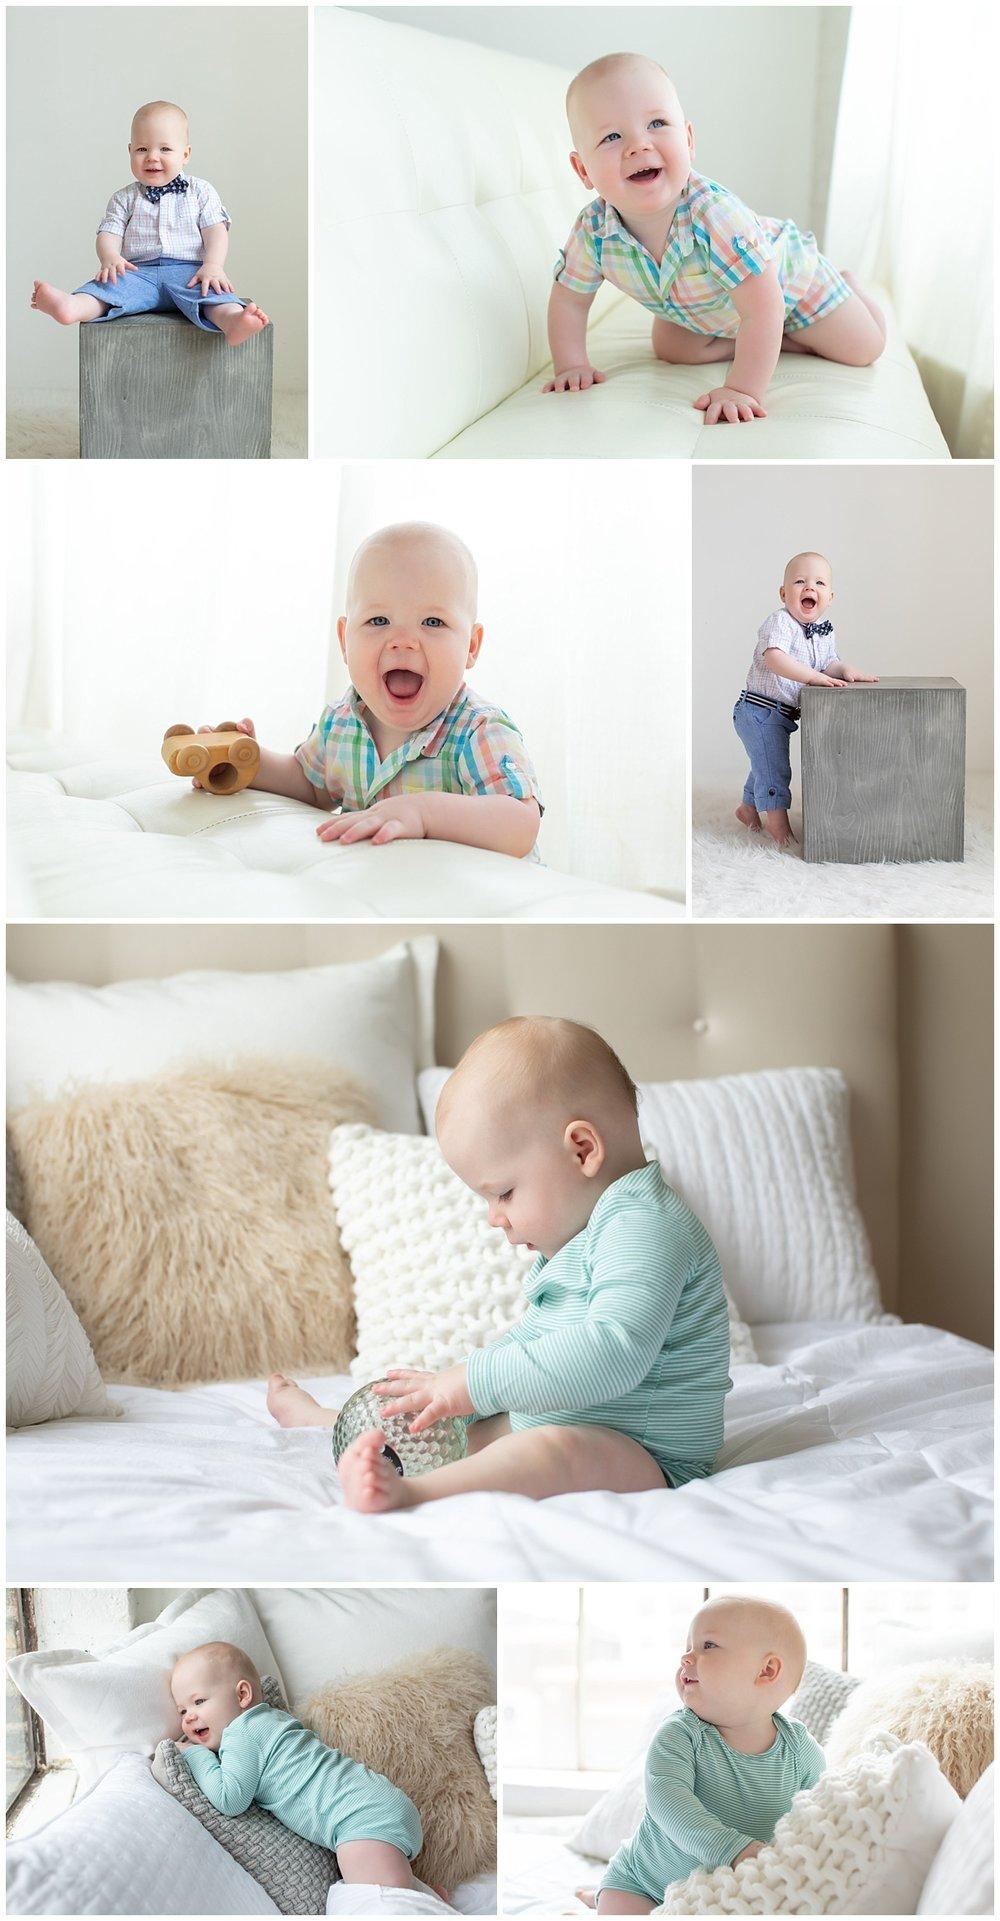 cute_baby_boy.jpg